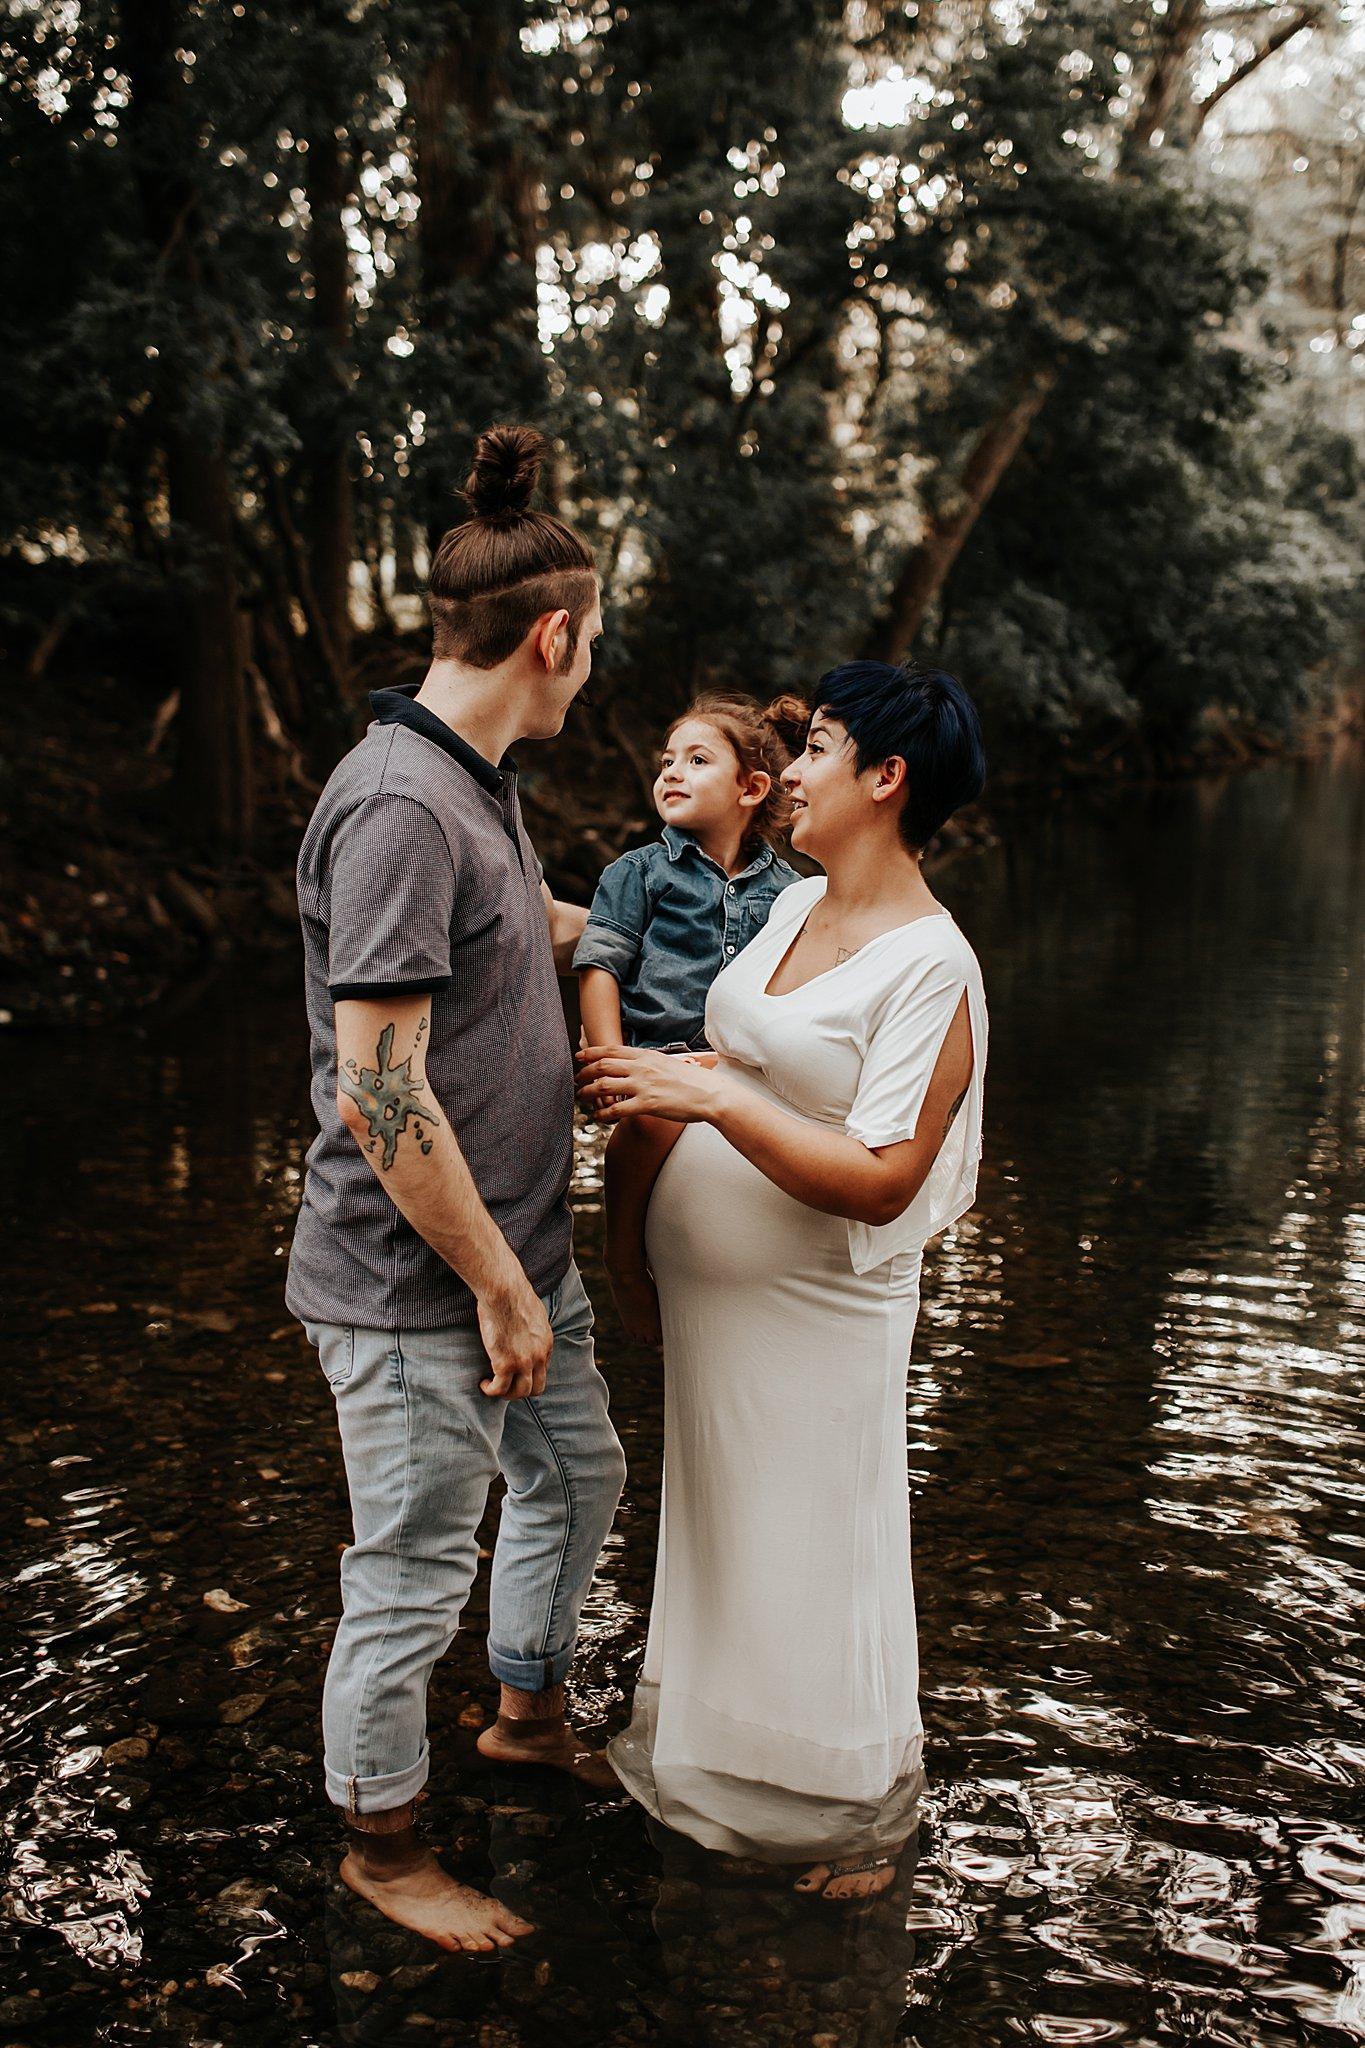 Meagan-San-Antonio-Maternity-Photographer-17_WEB.jpg